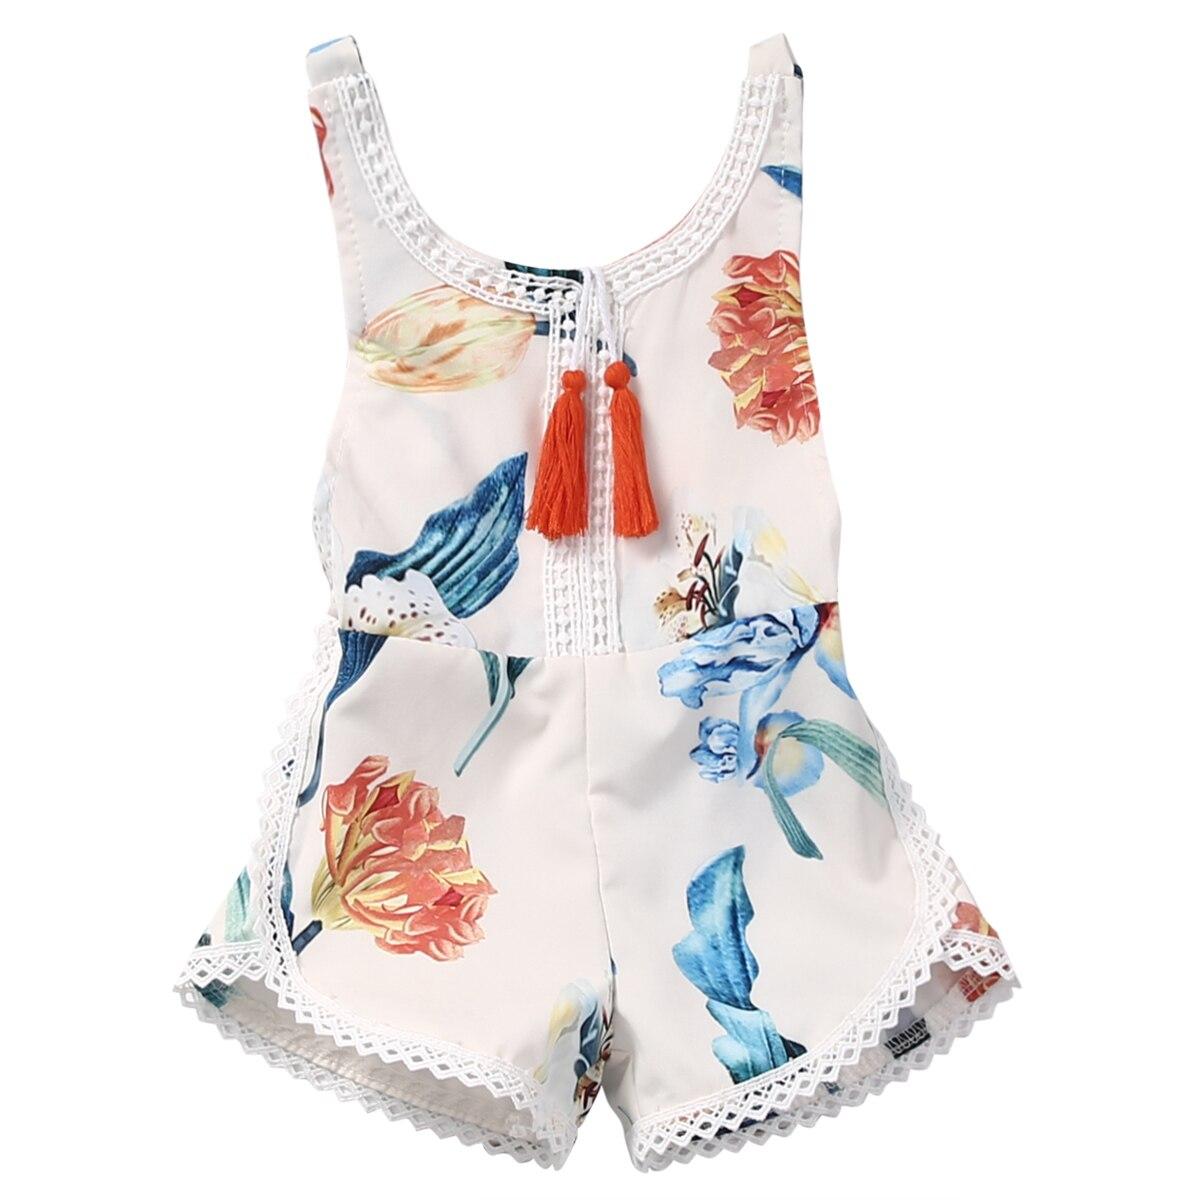 Us stock bebê meninas conjuntos de roupas de uma peça pendurado borlas knicker floral camisa branca roupa playsuit roupas infantis 0-4 t